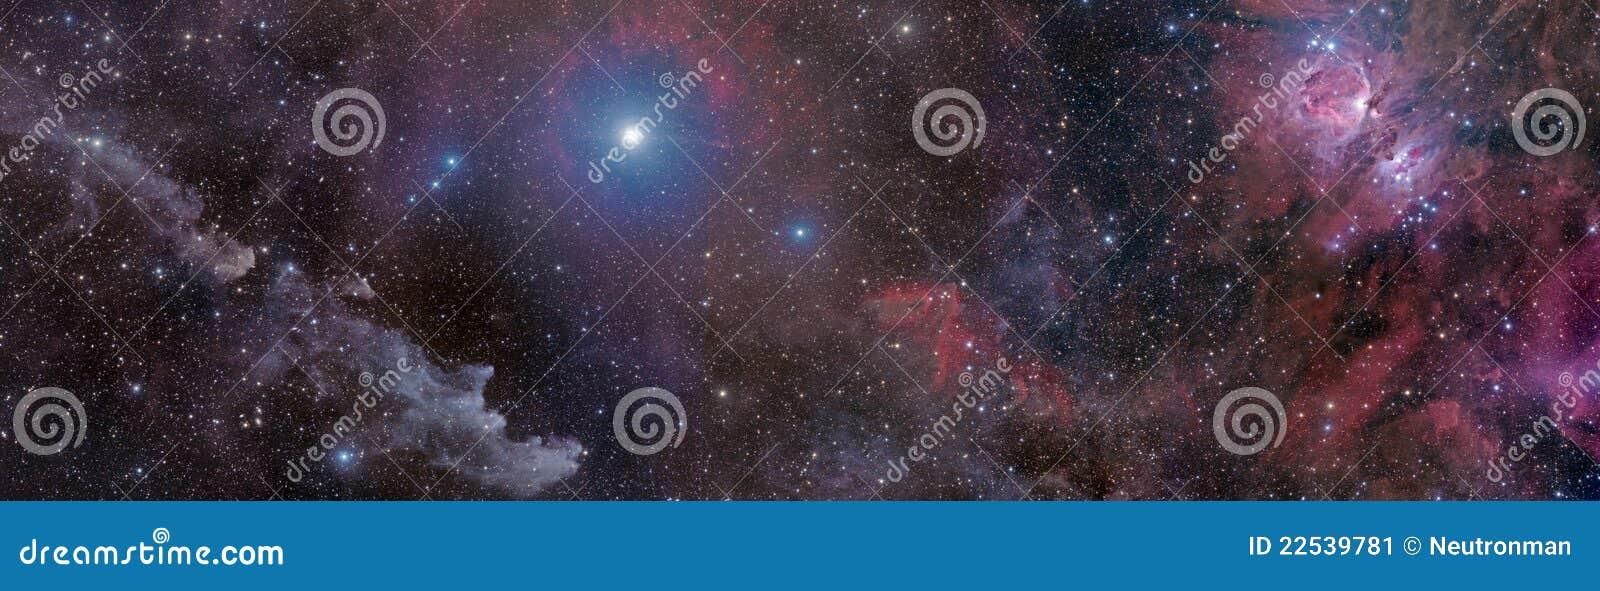 Hexe zur Klinge in Orion